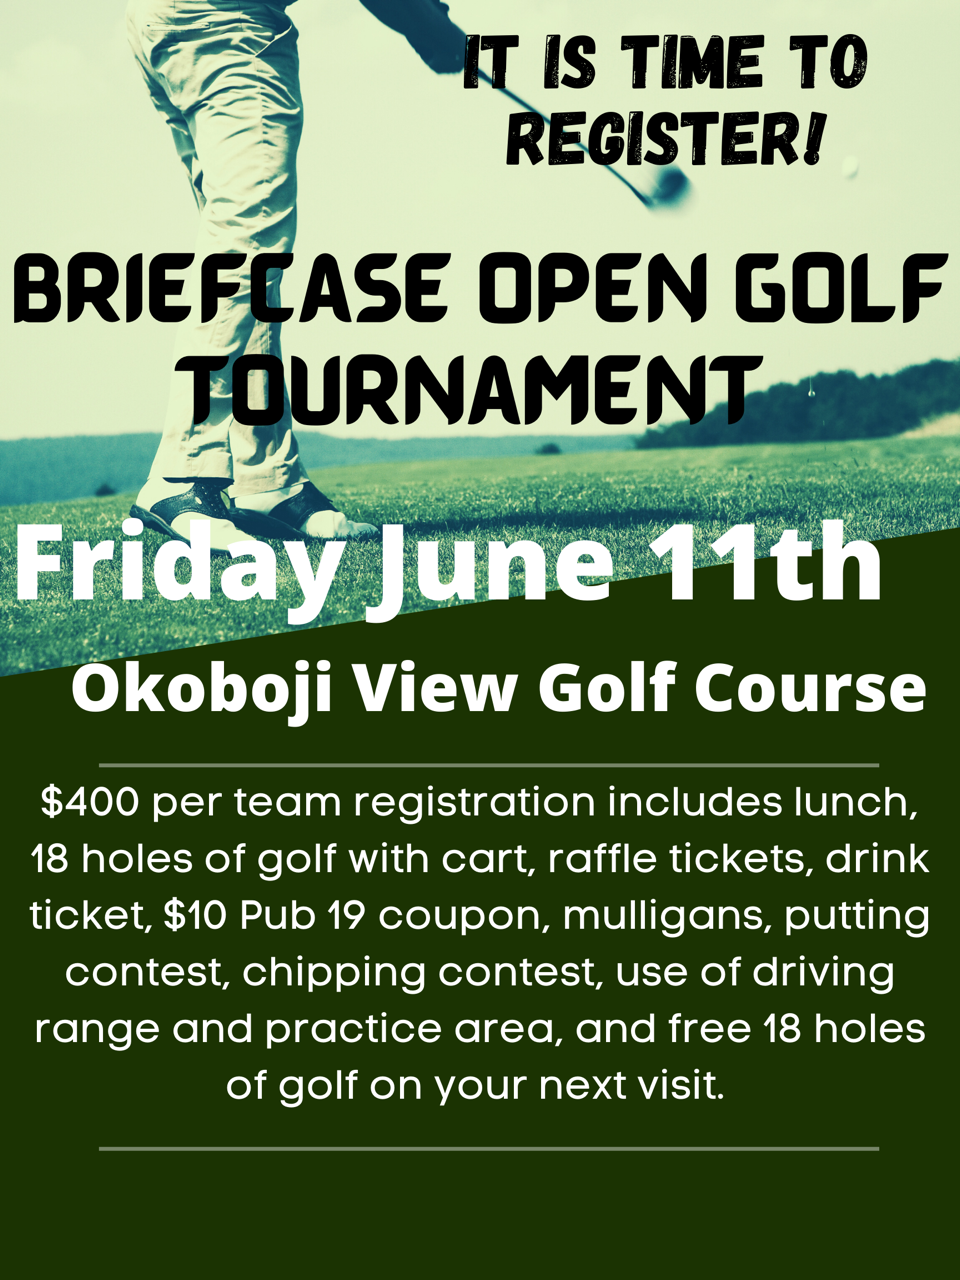 Breifcase Open Golf tournament-6